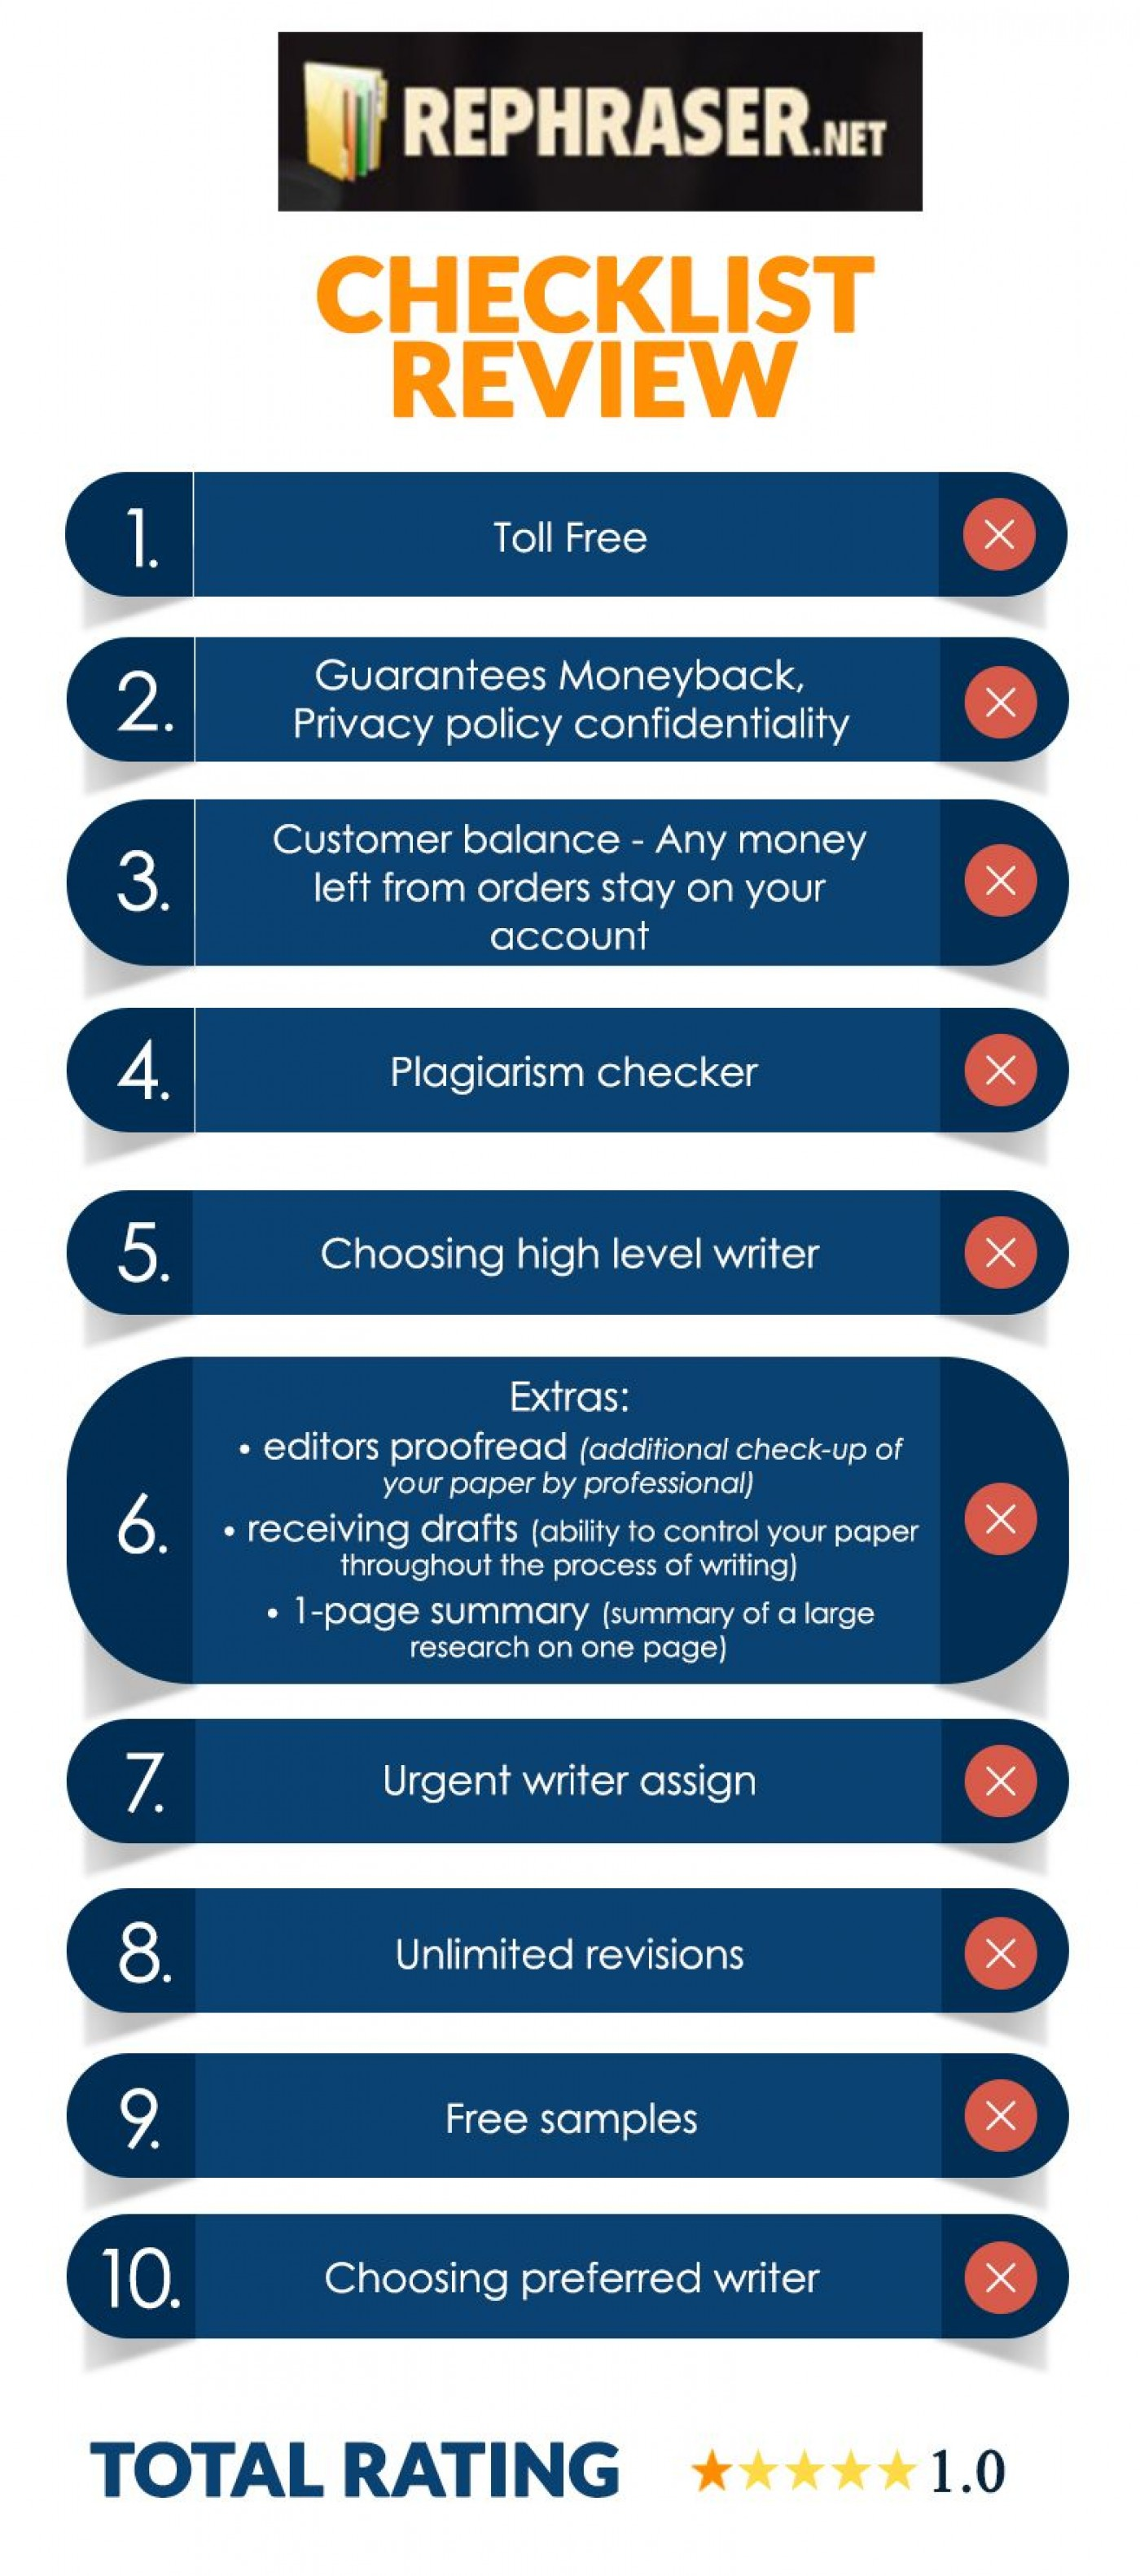 009 Essay Checker Free Online Amazing Sentence Grammar Plagiarism Document 1400